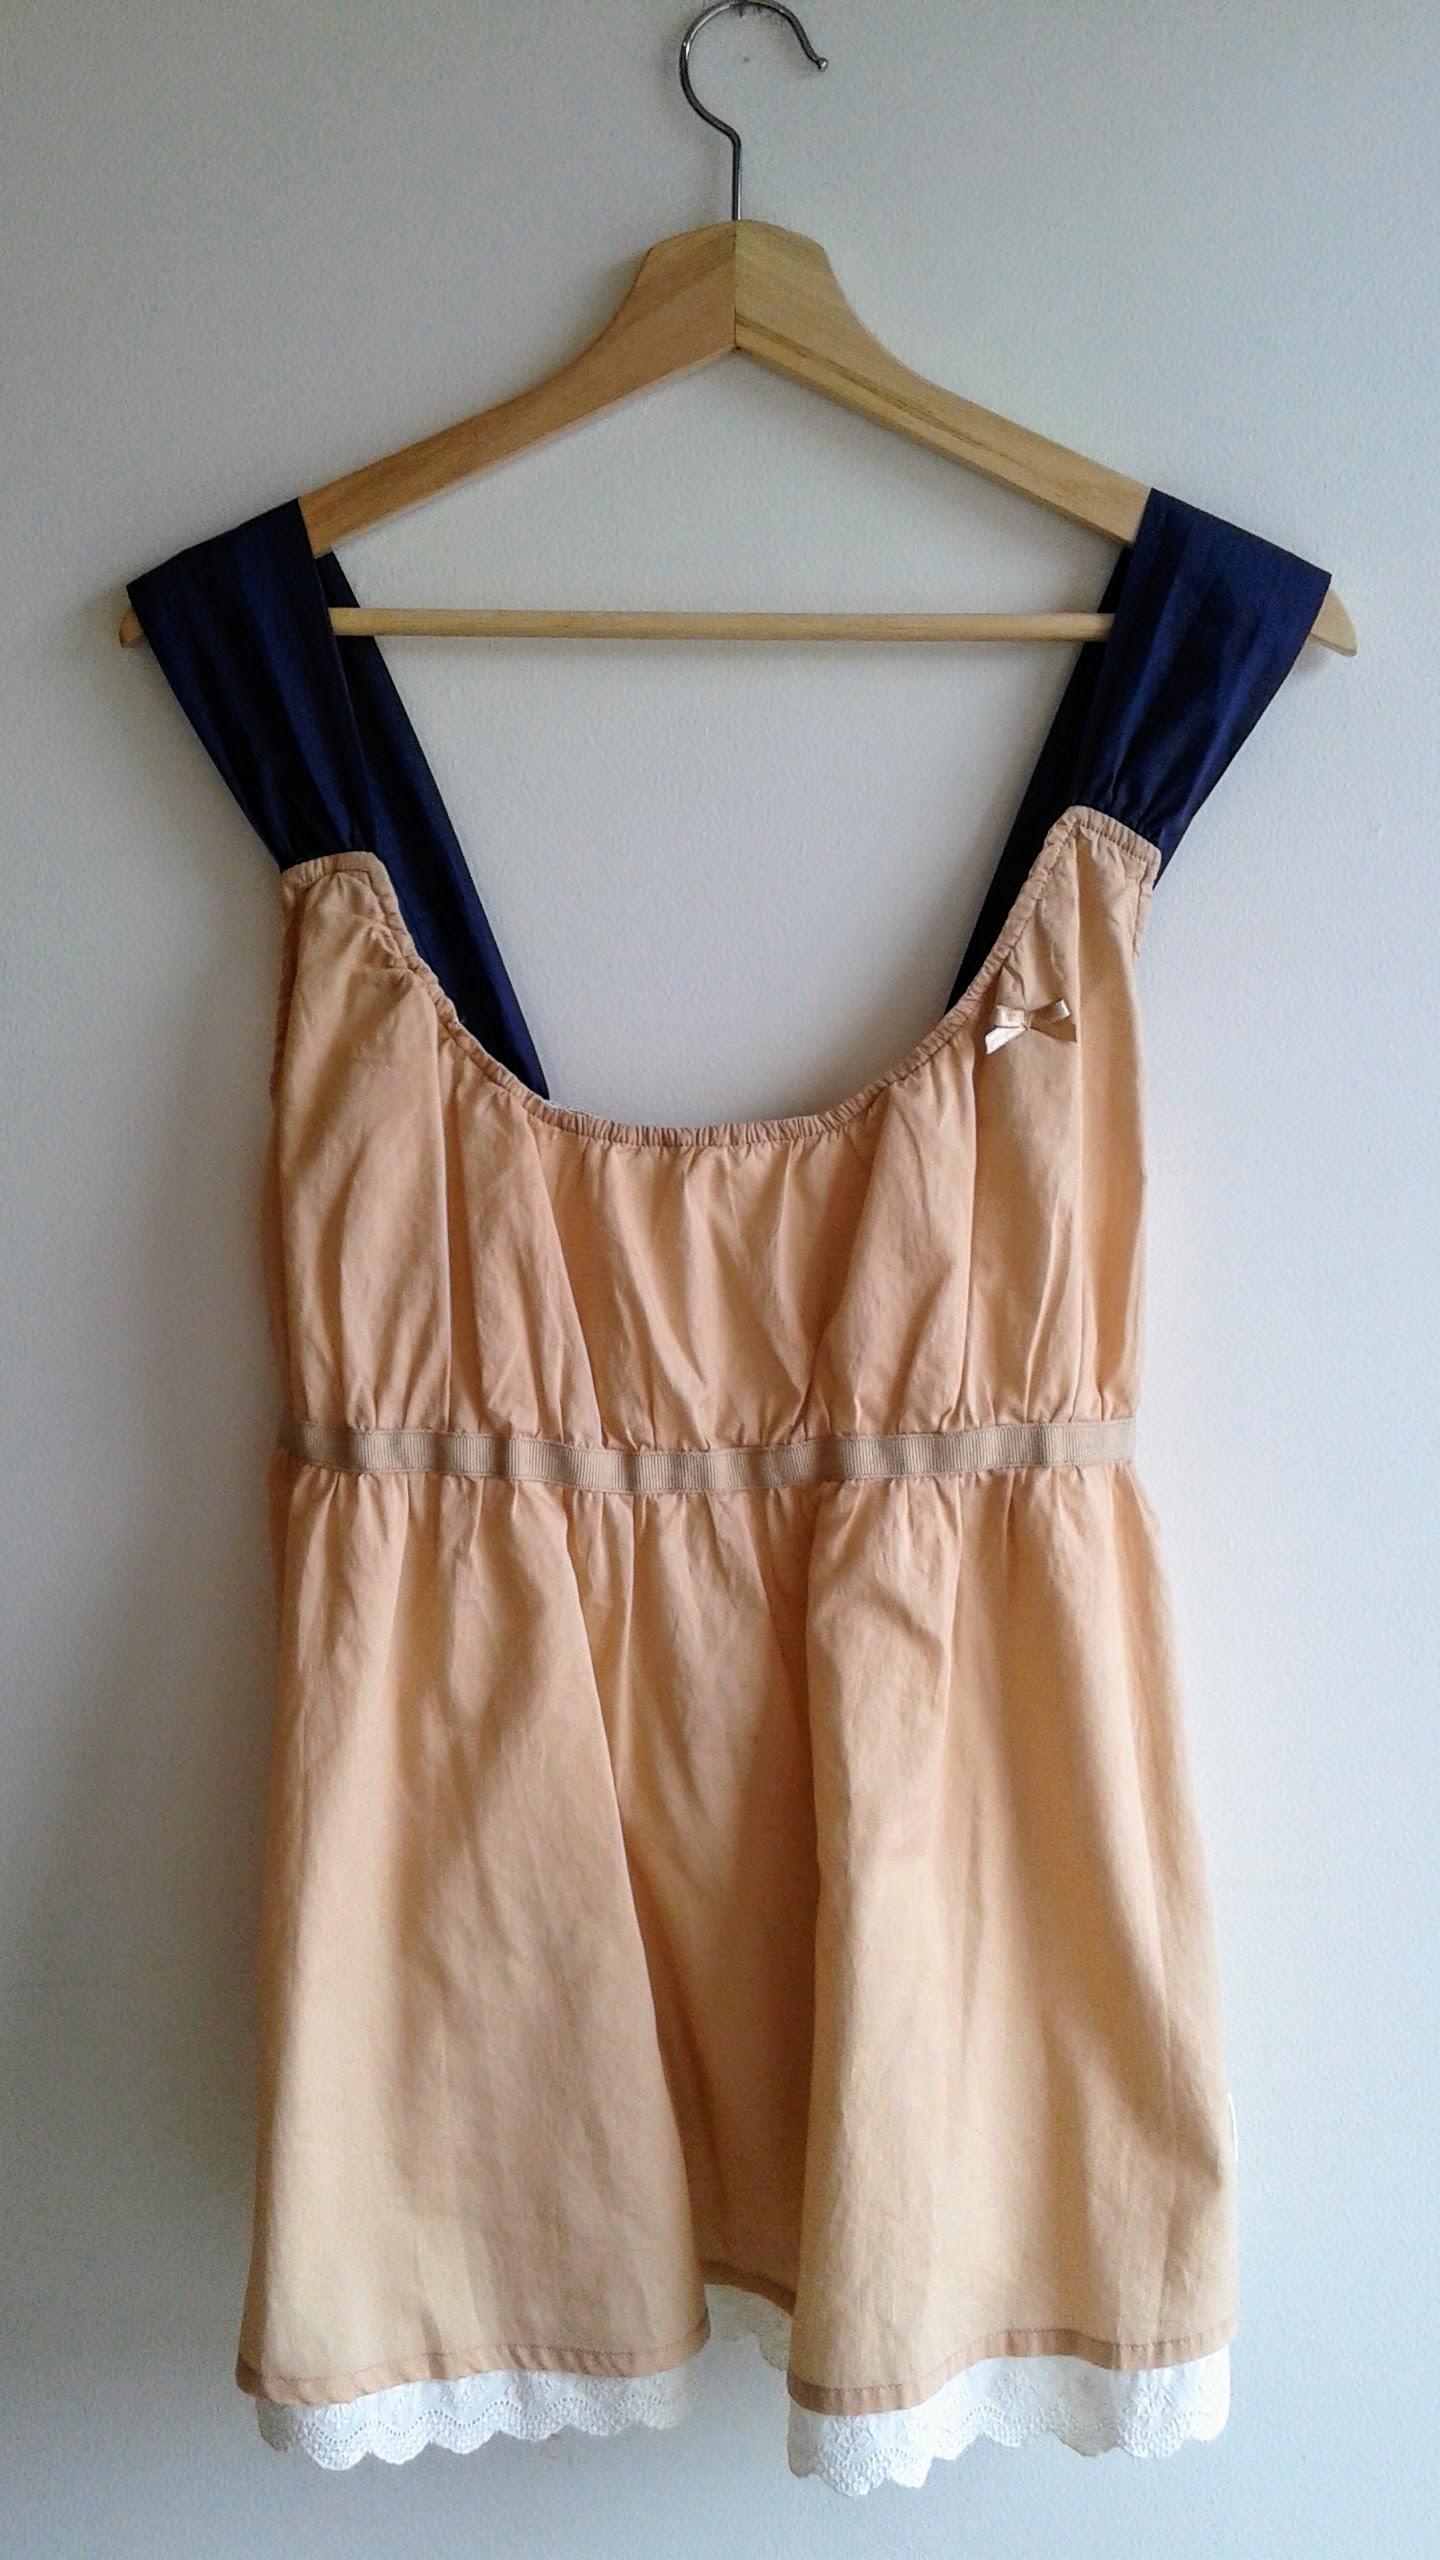 Odd Molly top; Size S, $24